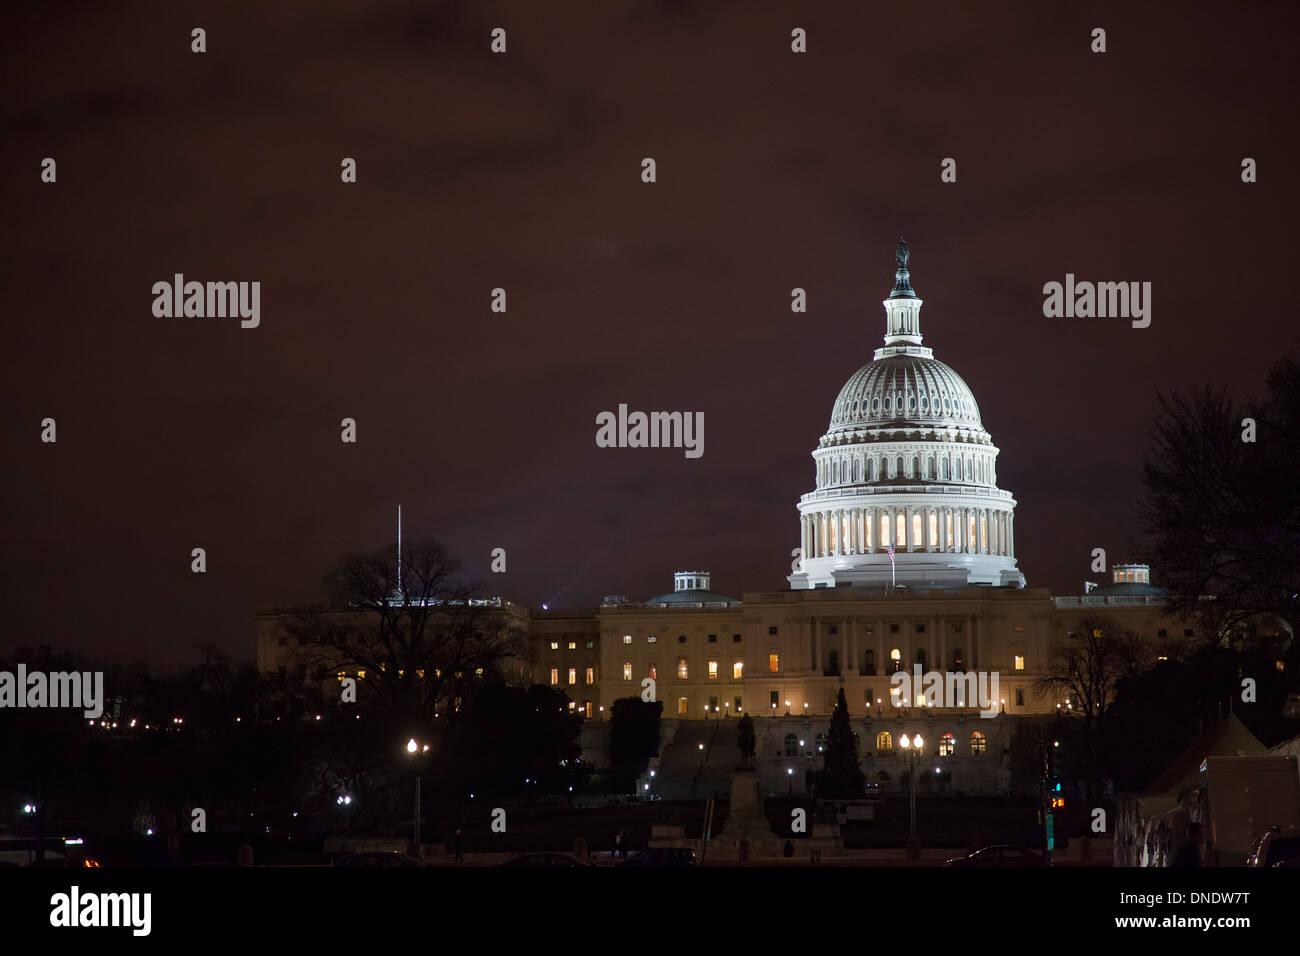 Washington, DC - The U.S. Capitol at night. - Stock Image